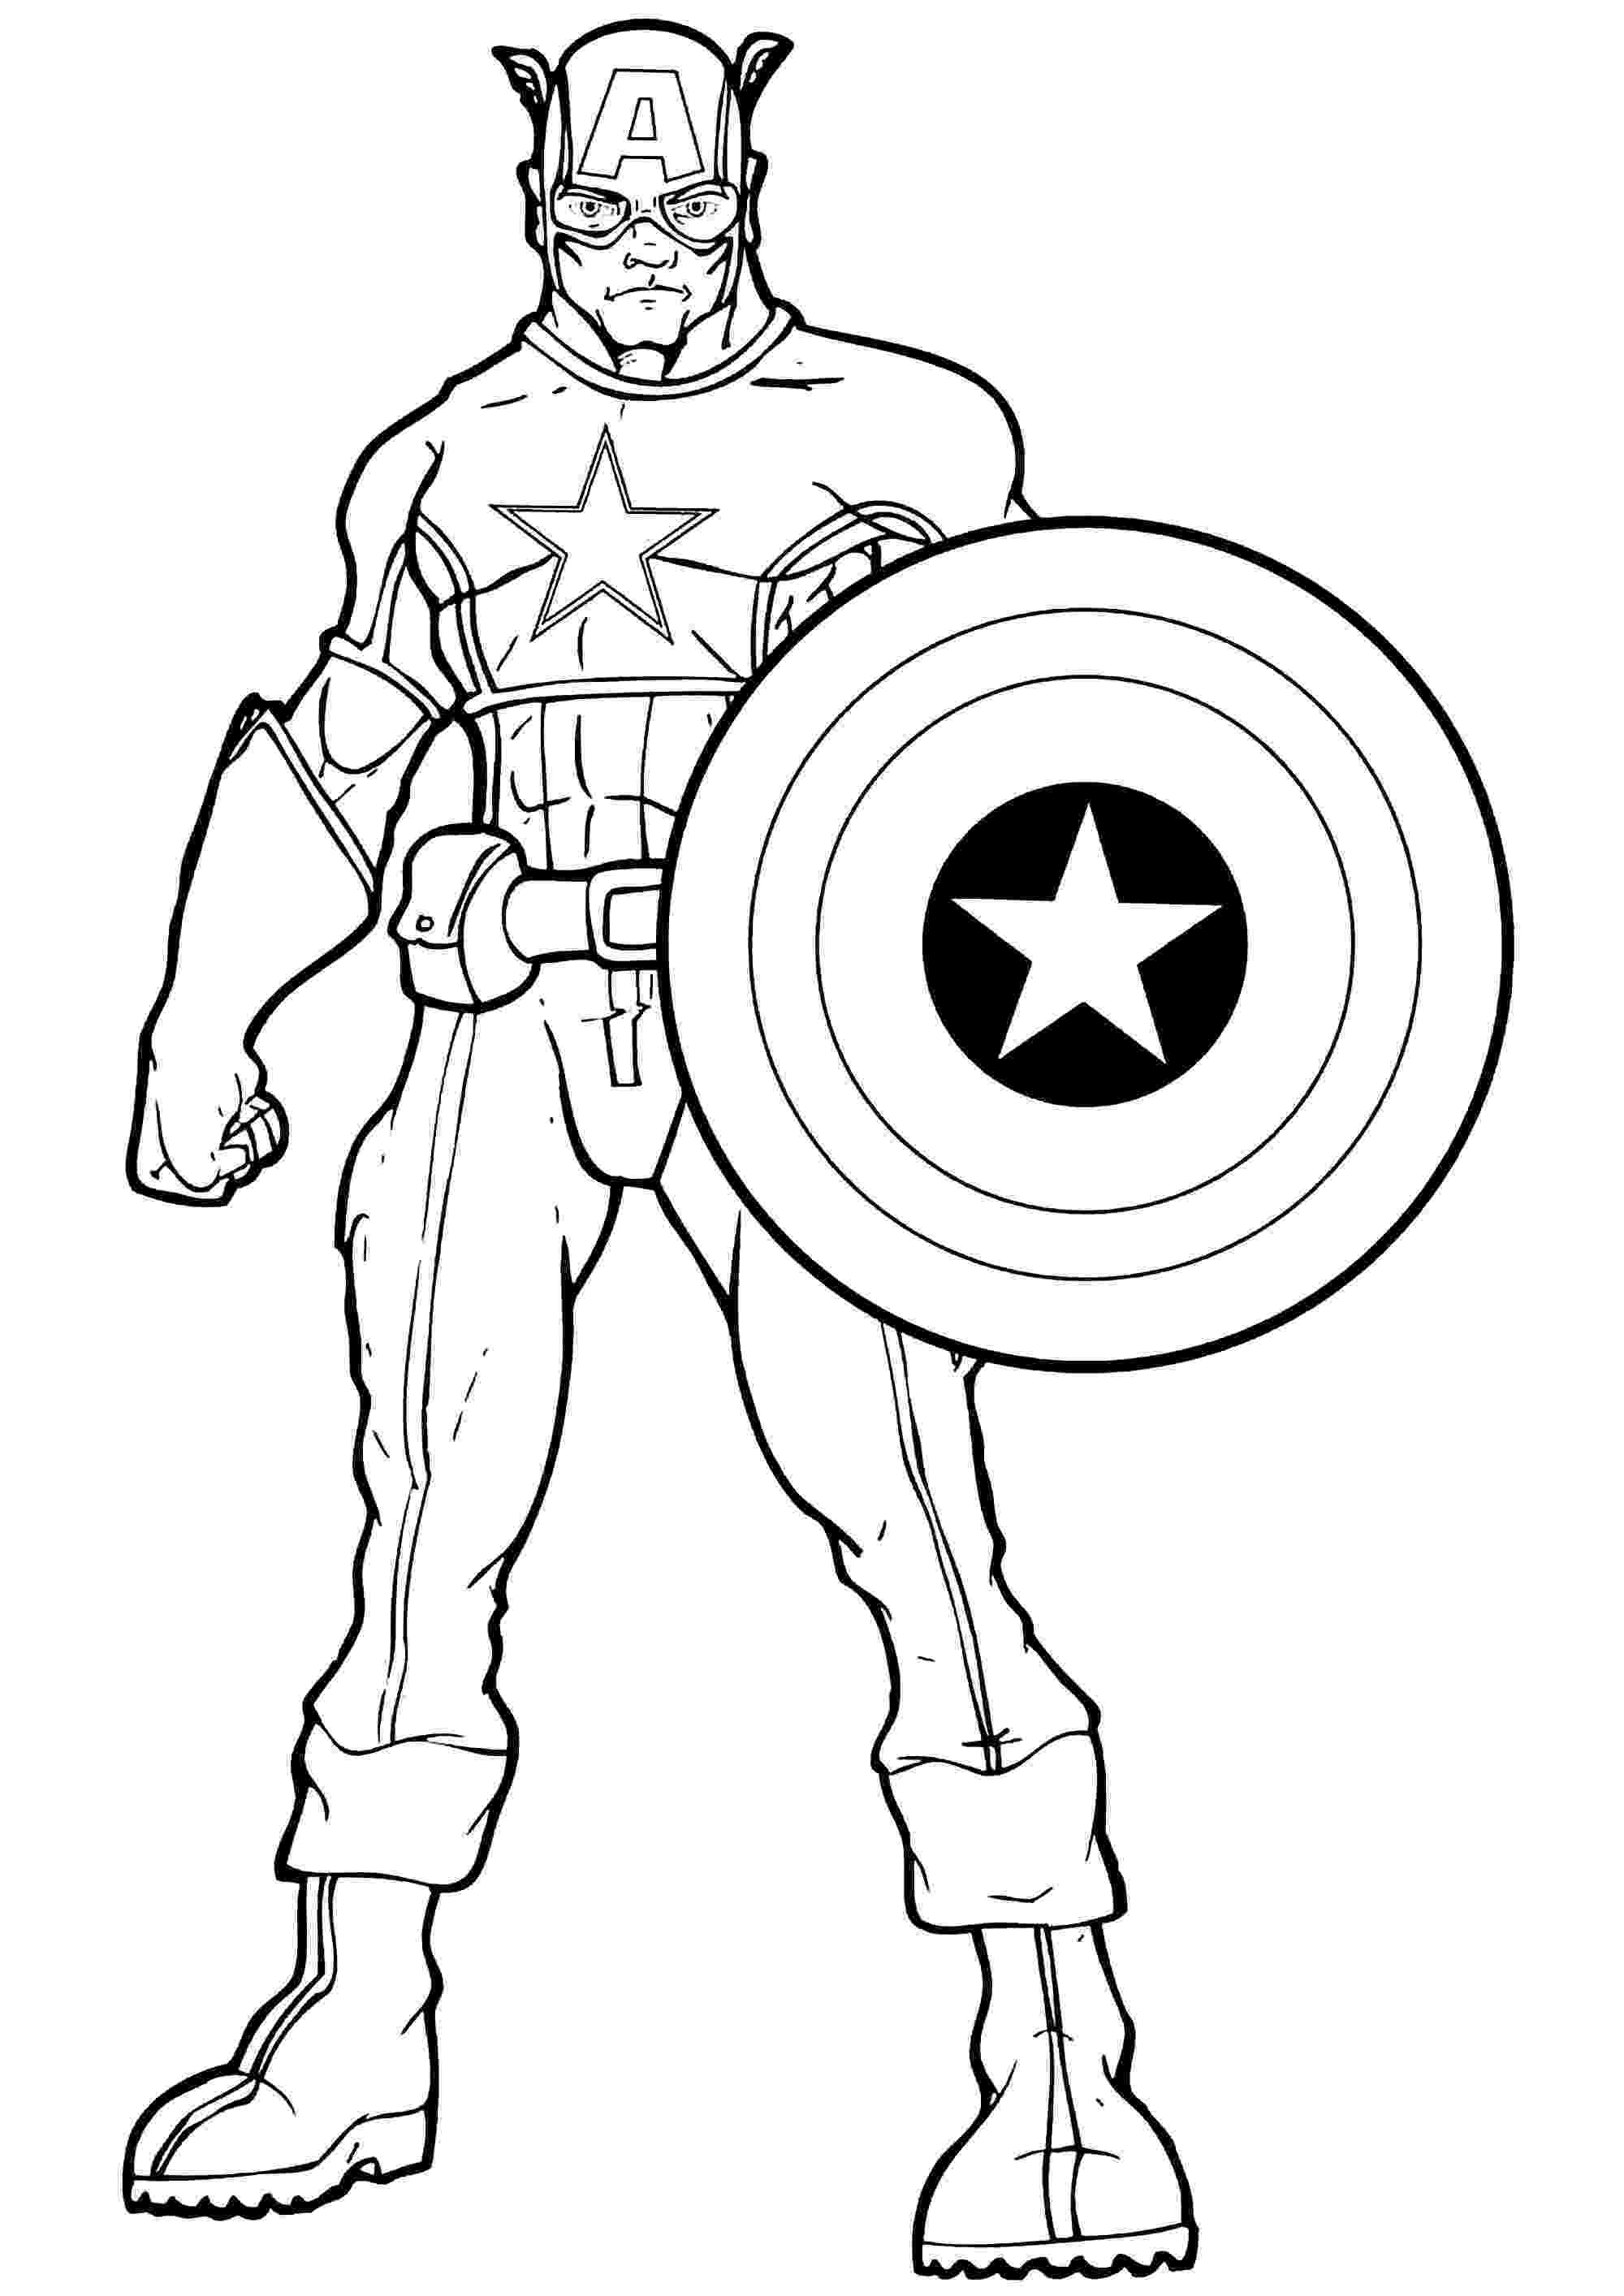 captain america coloring pages captain america coloring pages free printable coloring coloring pages america captain